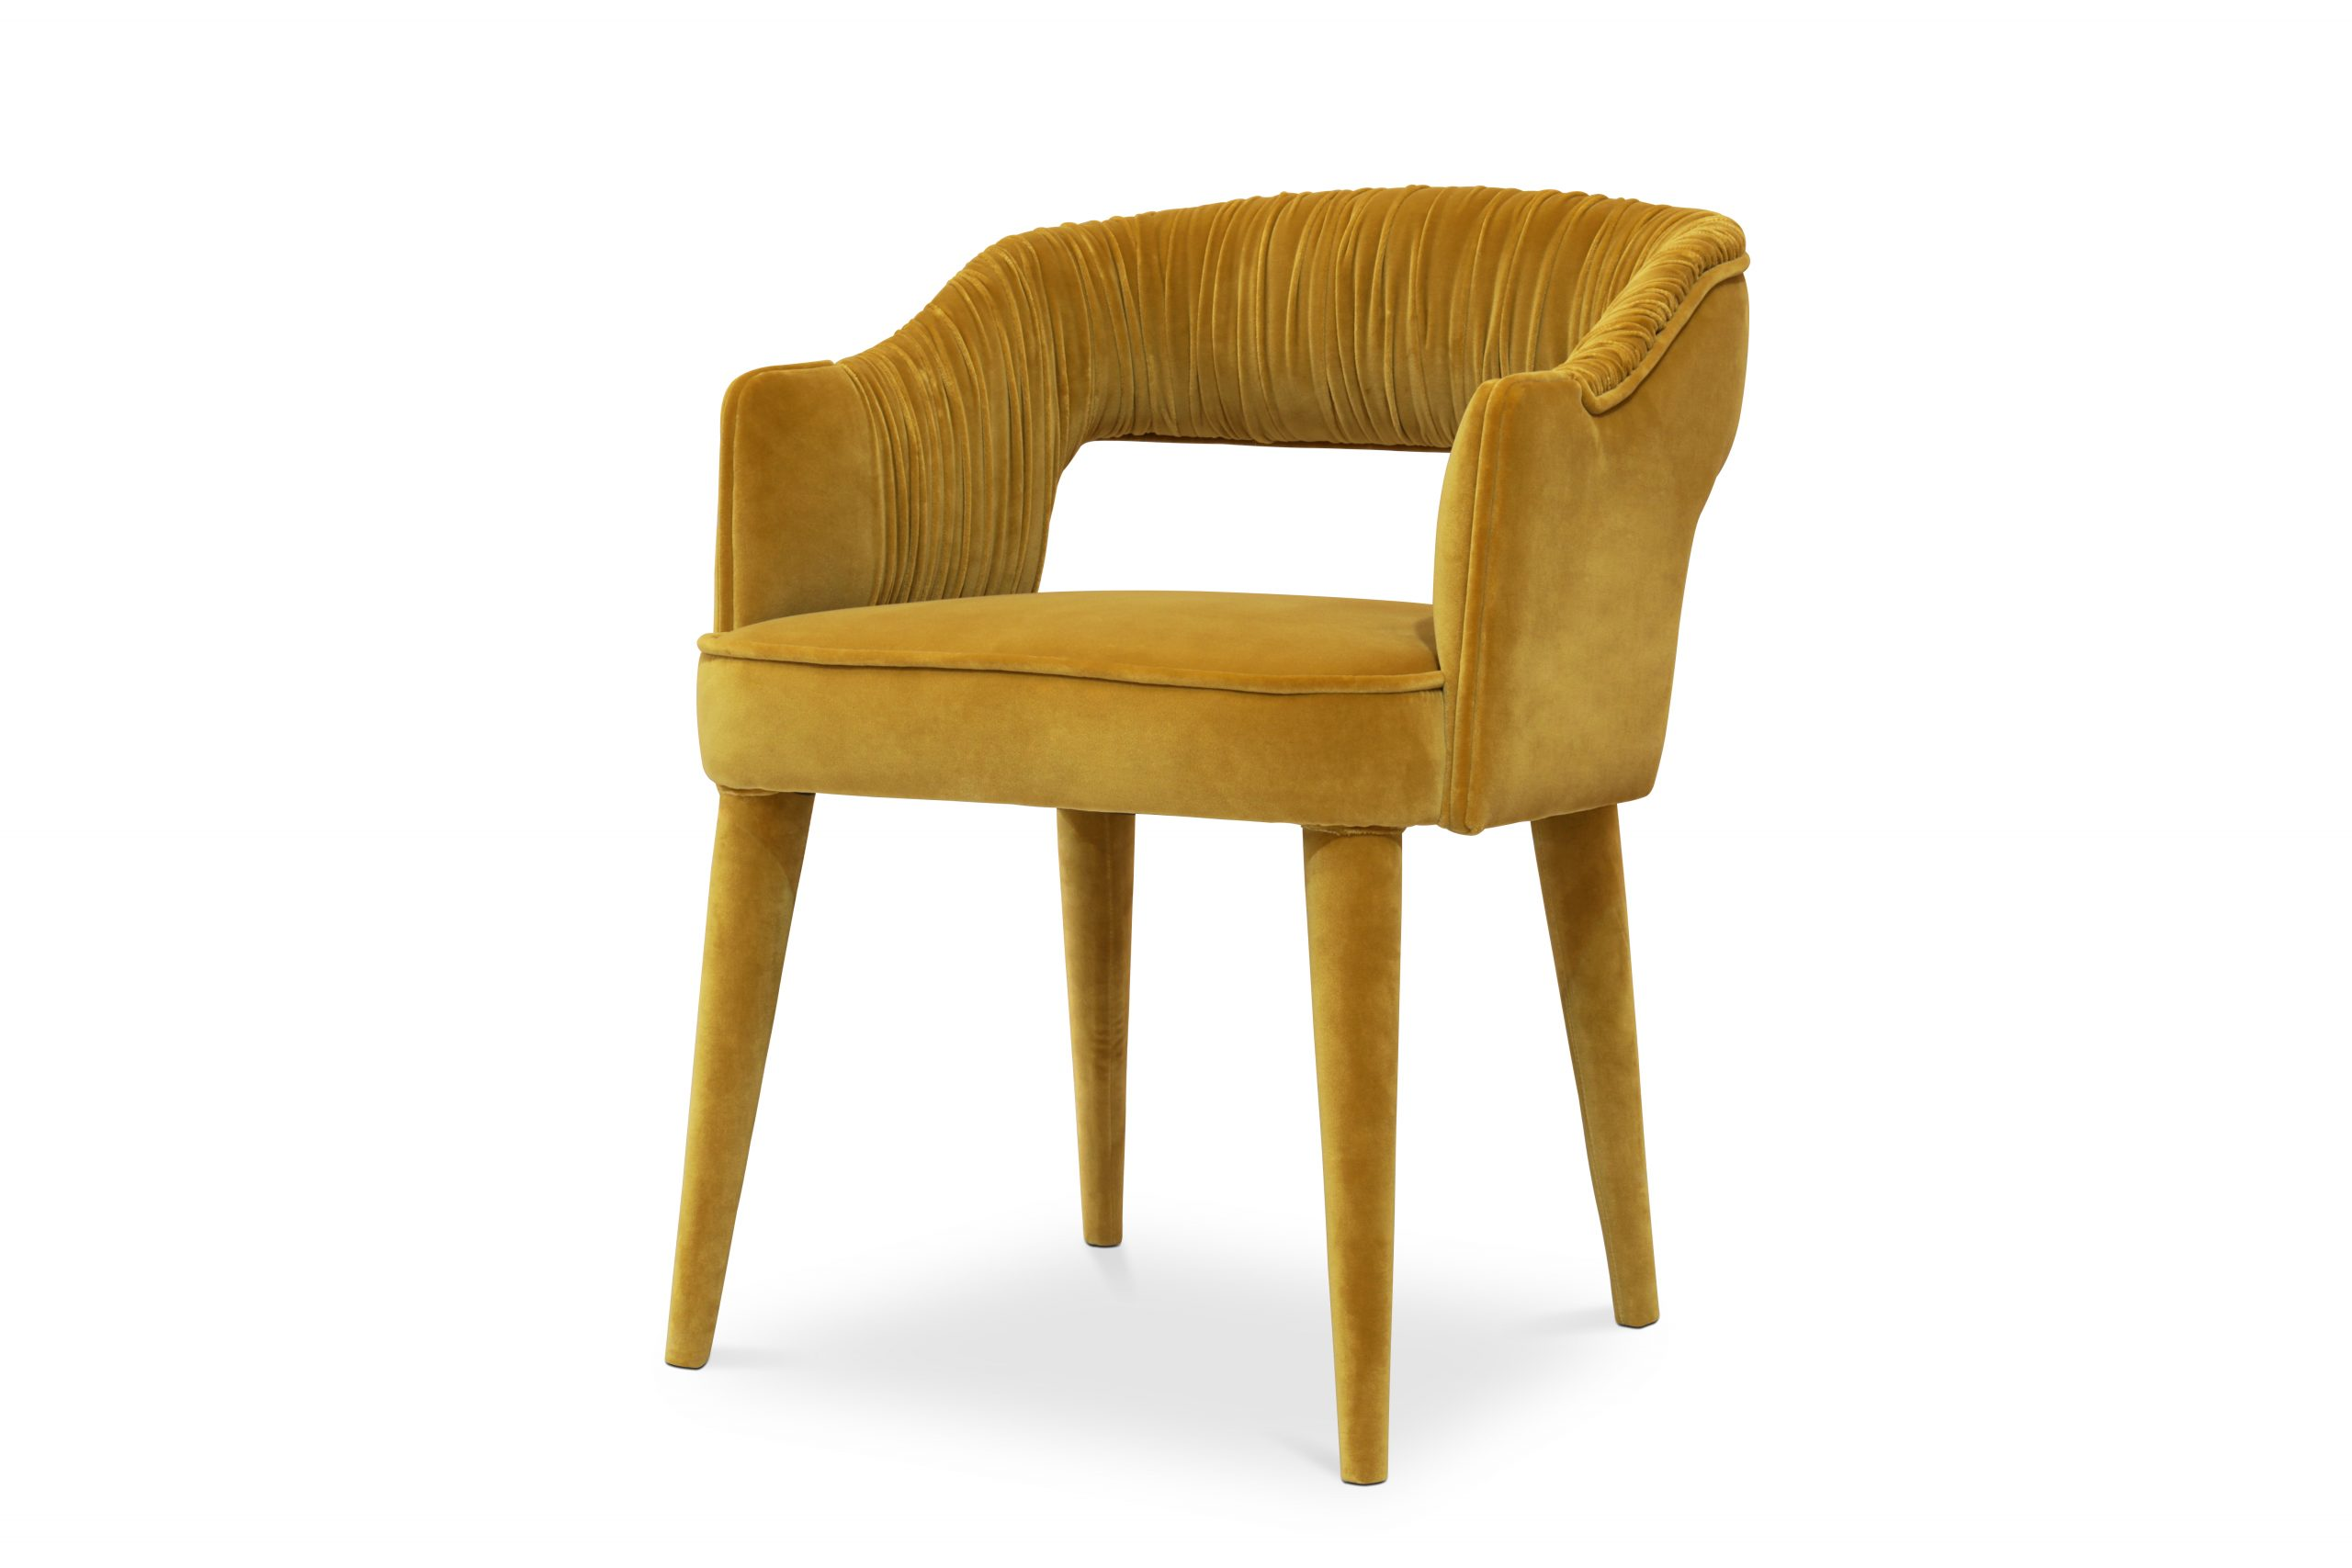 STOLA Dining Chair; Dining Chair; Upholstery; Modern; Sophistication; Elegance; Classiness; Comfort; Fierceness; BRABBU; Design; Furniture stola dining chairSTOLA Dining Chair: A Symbol of Elegance and SophisticationSTOLA Dining chair 2 scaled